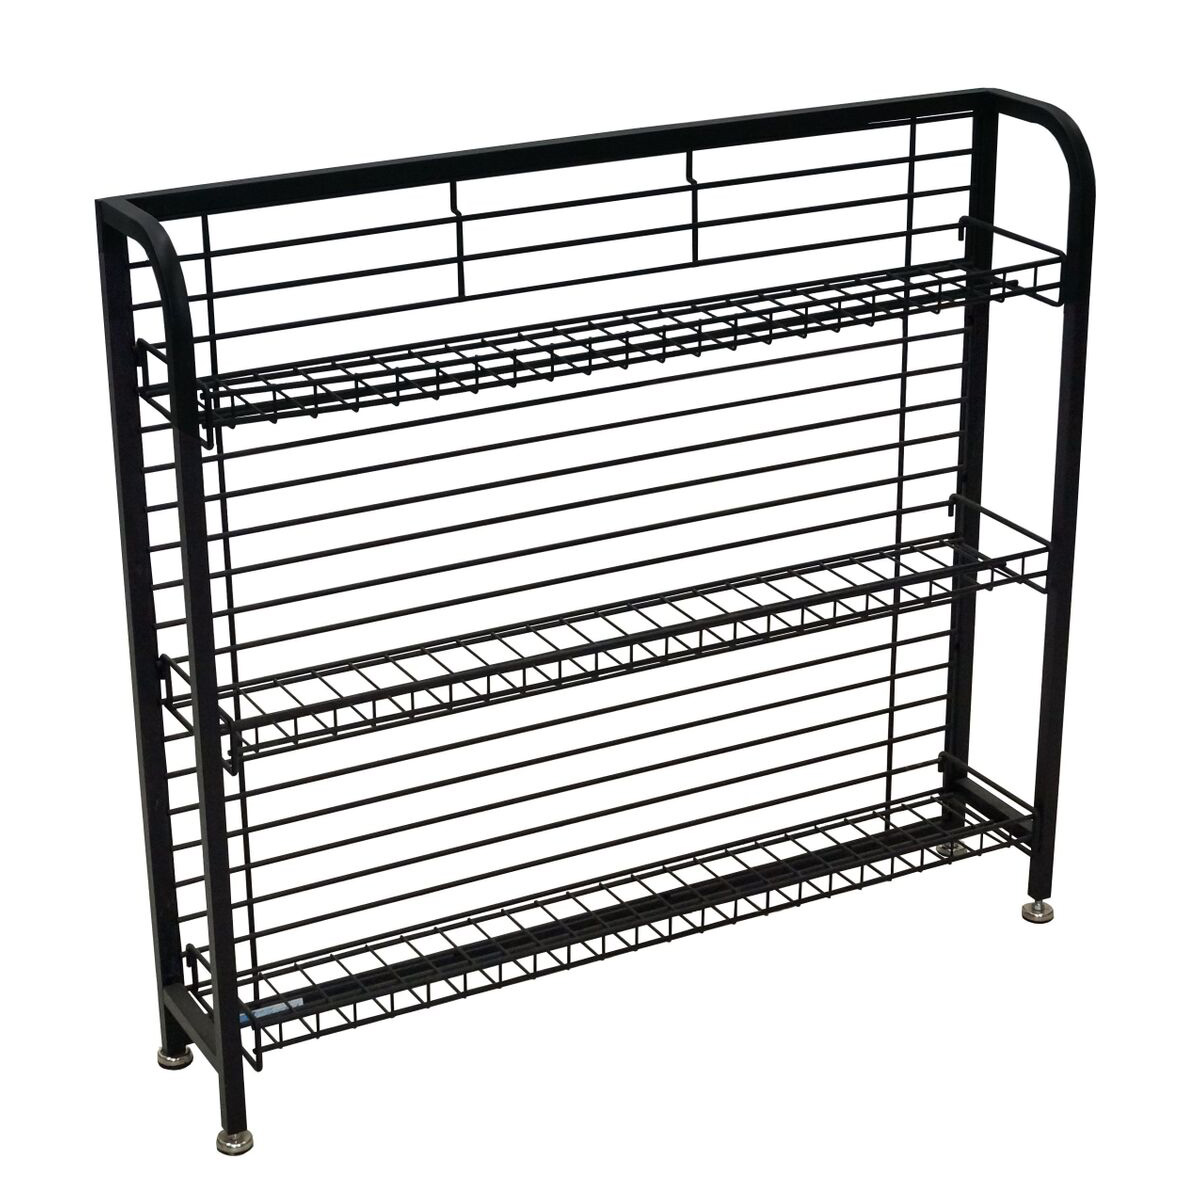 Black For Sale Floor Flat or Slanted 4 Shelf Wire Display Rack